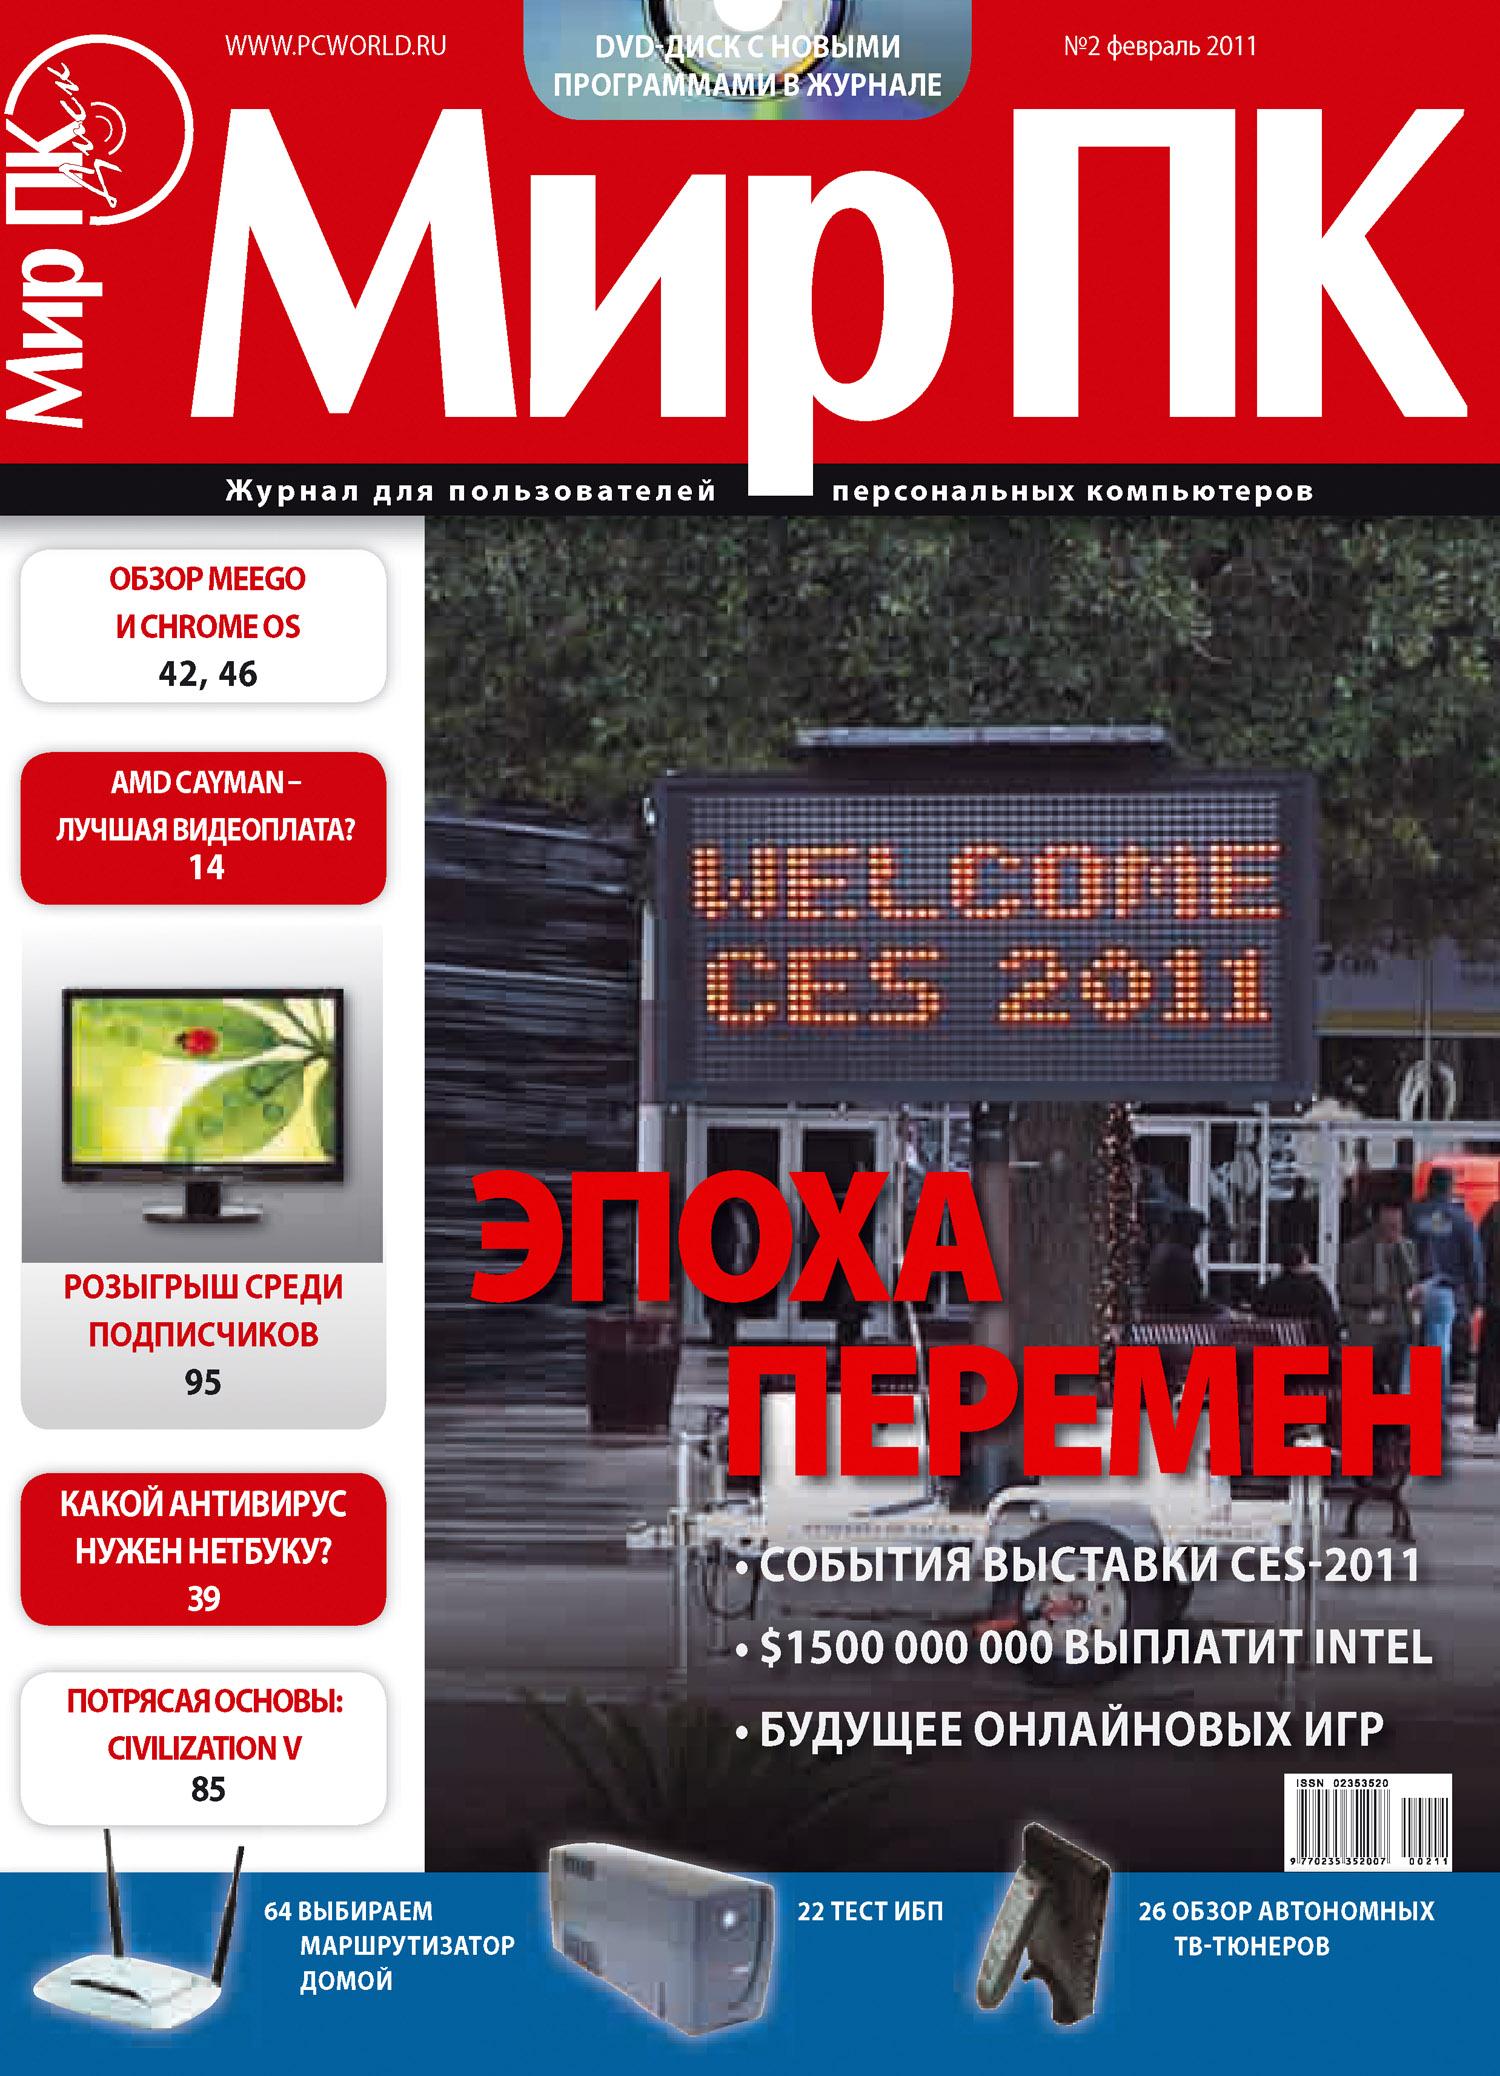 Журнал «Мир ПК» №02/2011